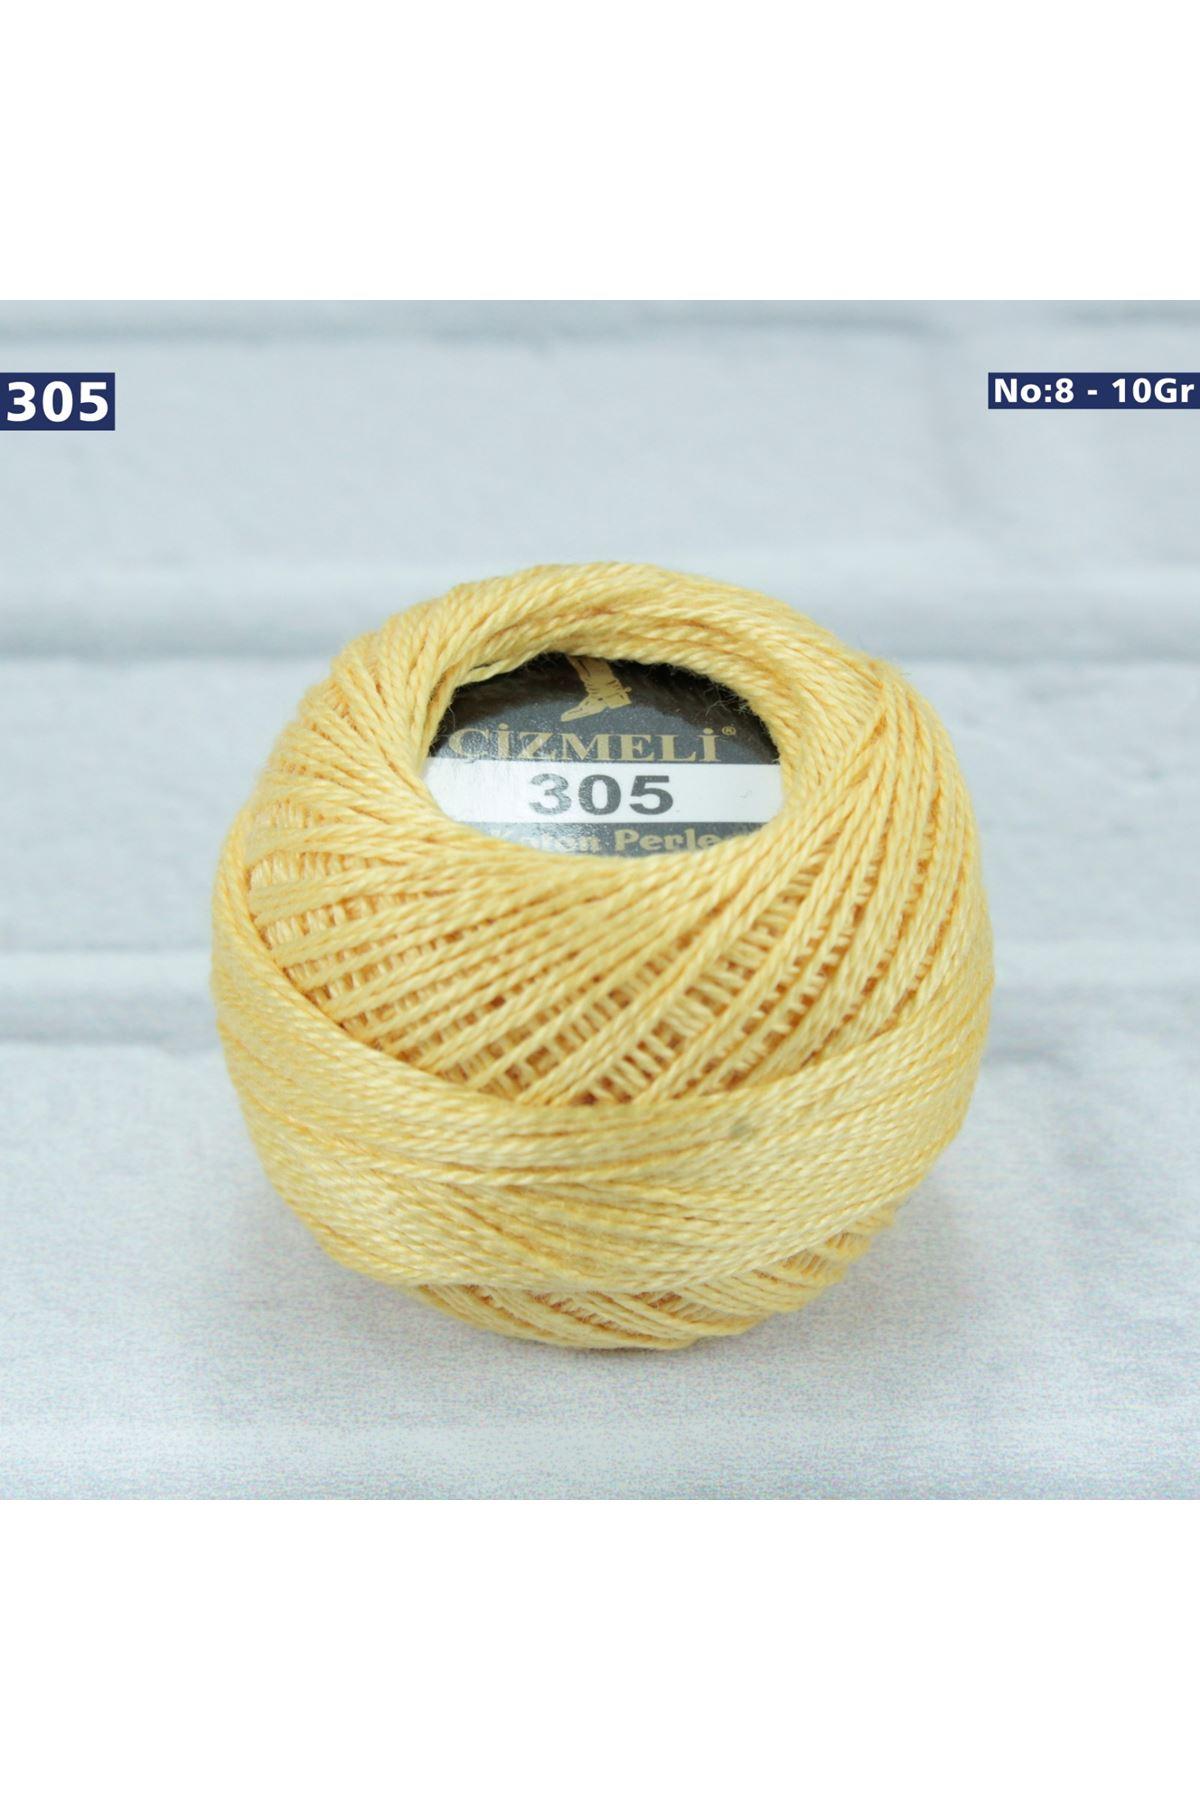 Çizmeli Cotton Perle Nakış İpliği No: 305